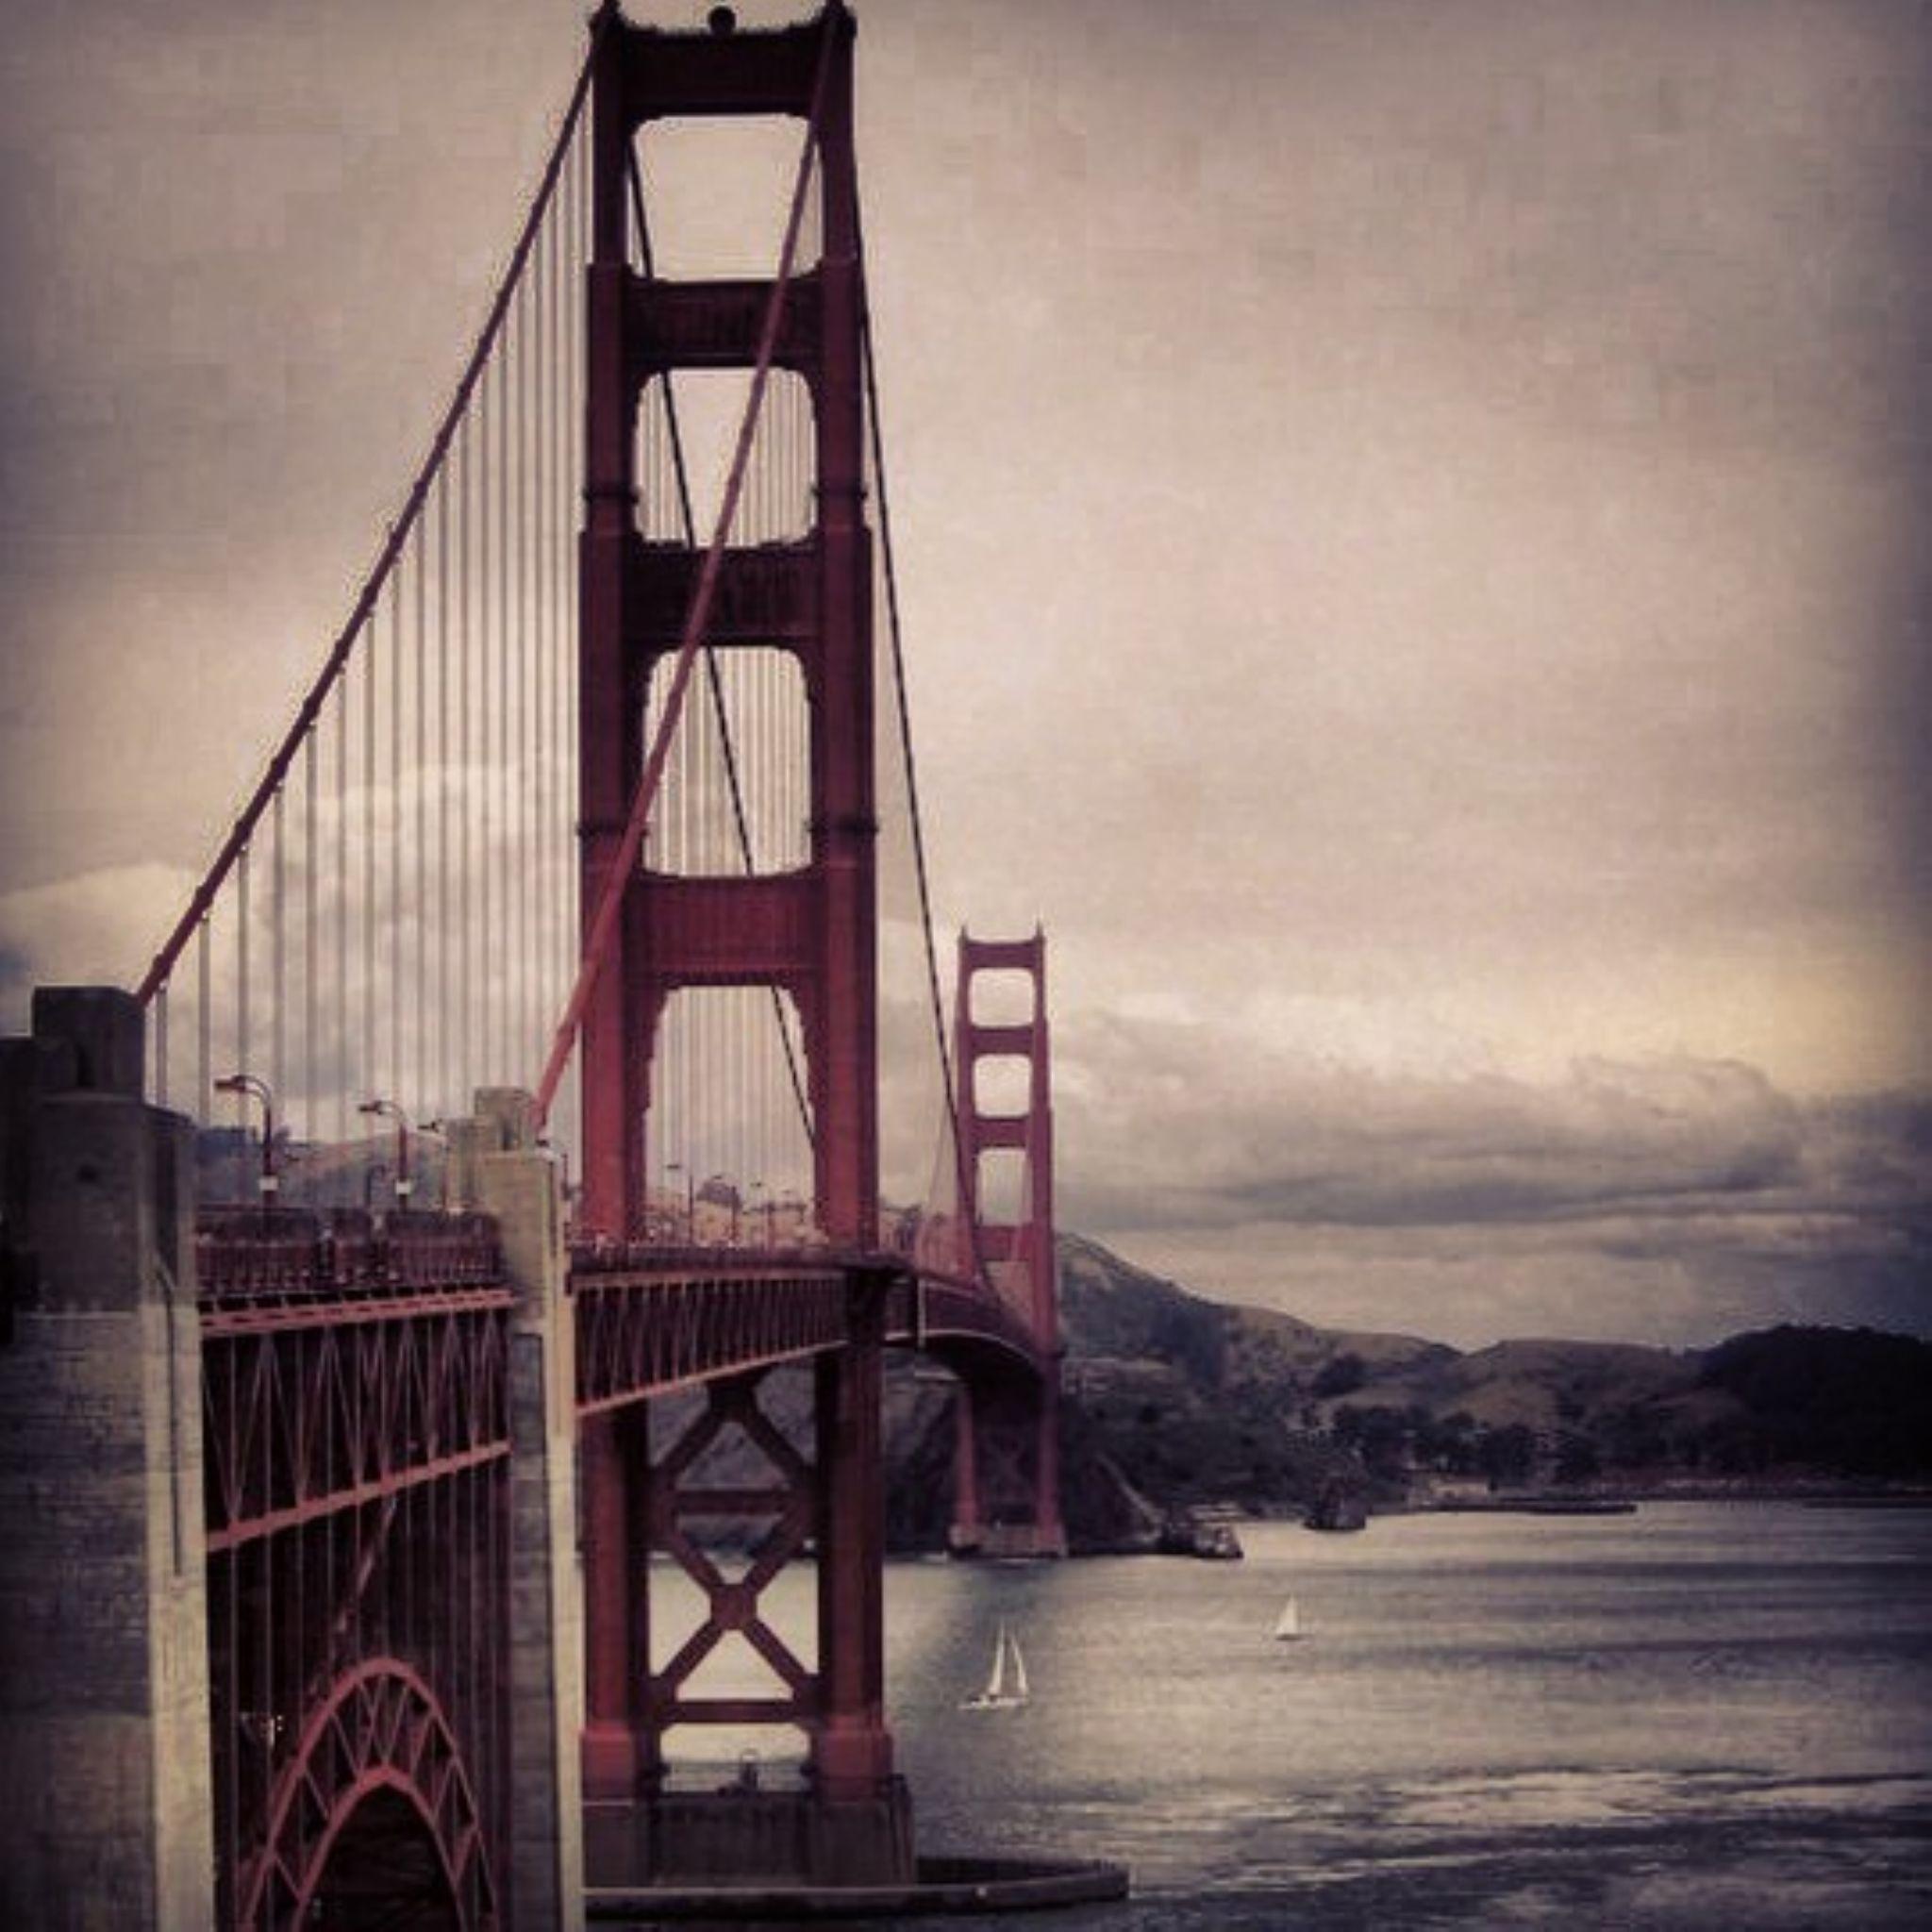 Golden Gate by sandyleinnr